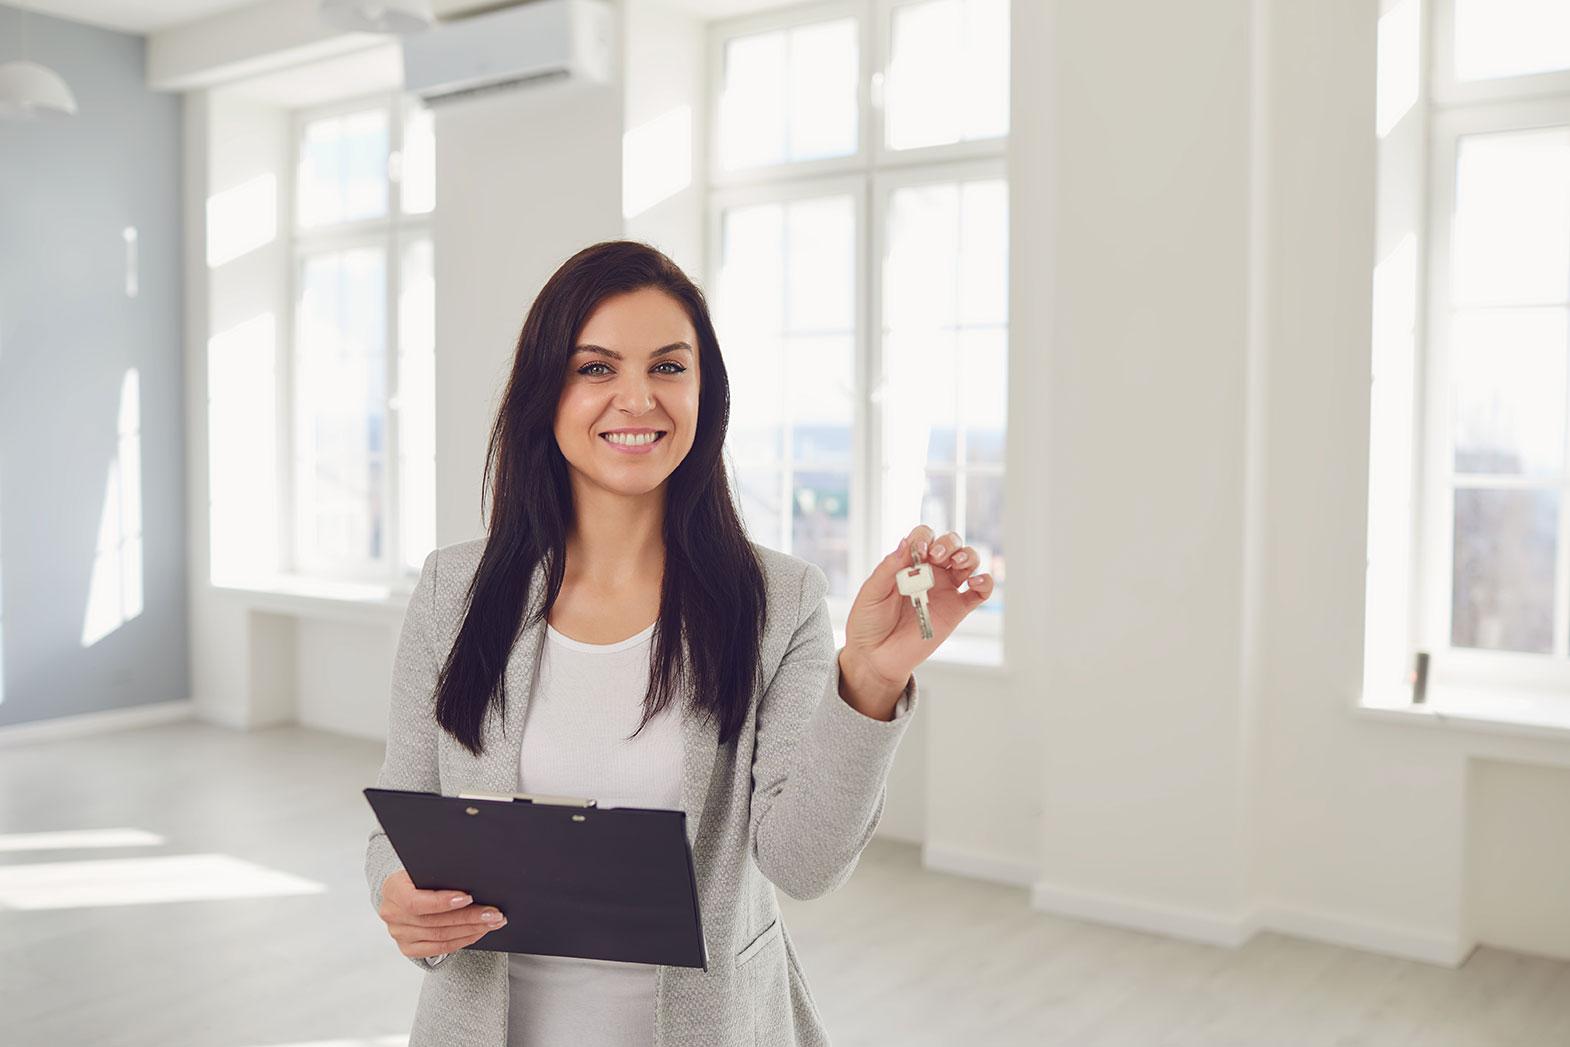 negociateur immobilier femme